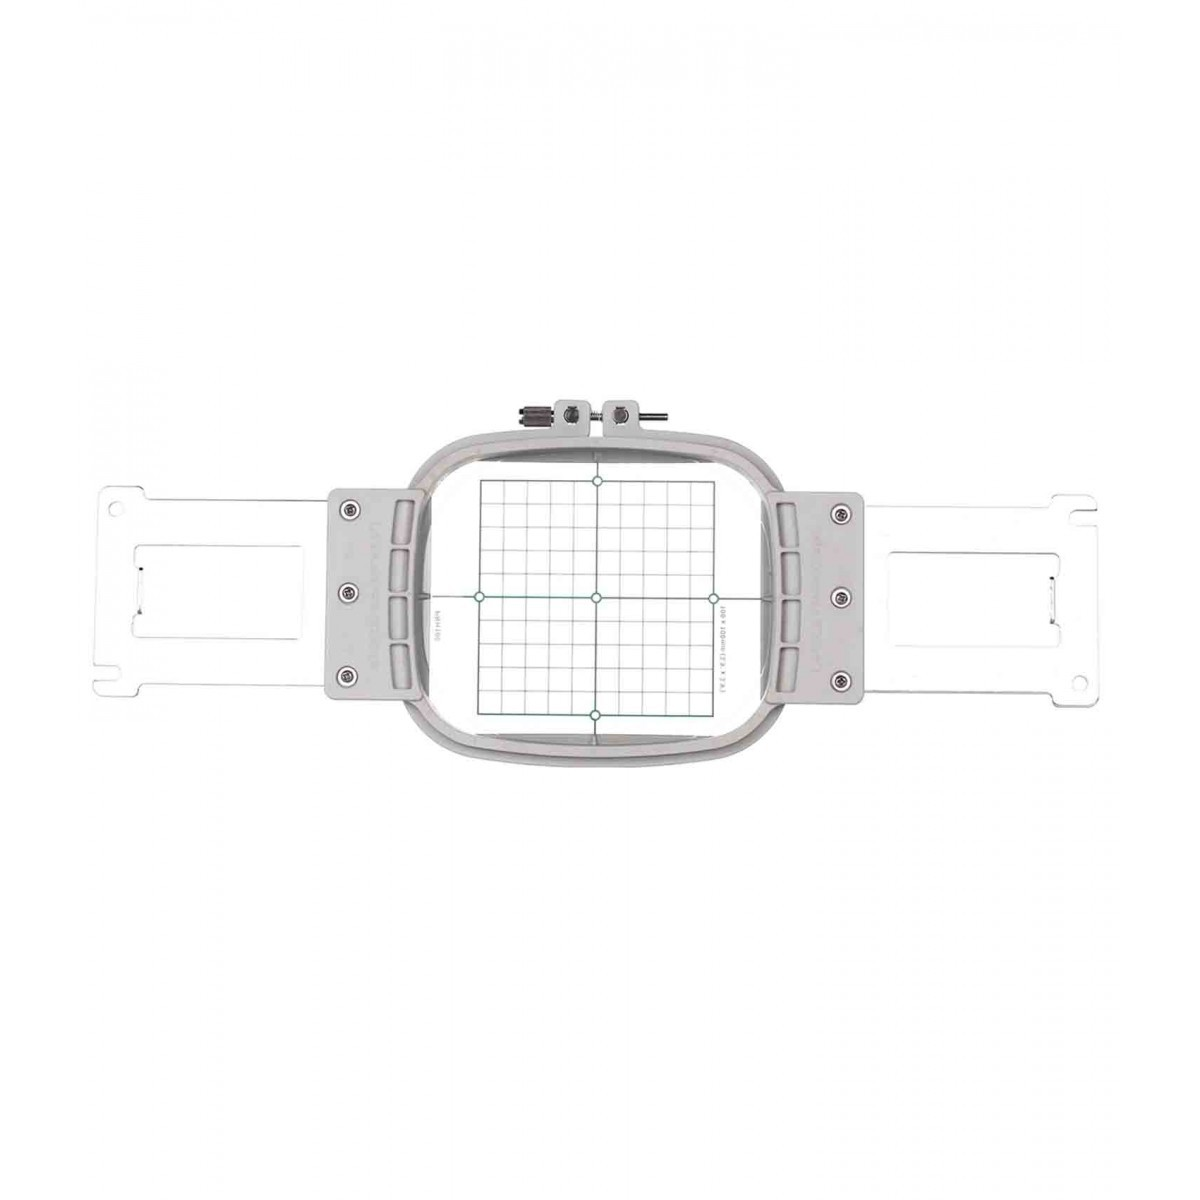 Bastidor Brother PRH-100 área de 10x10 cm.